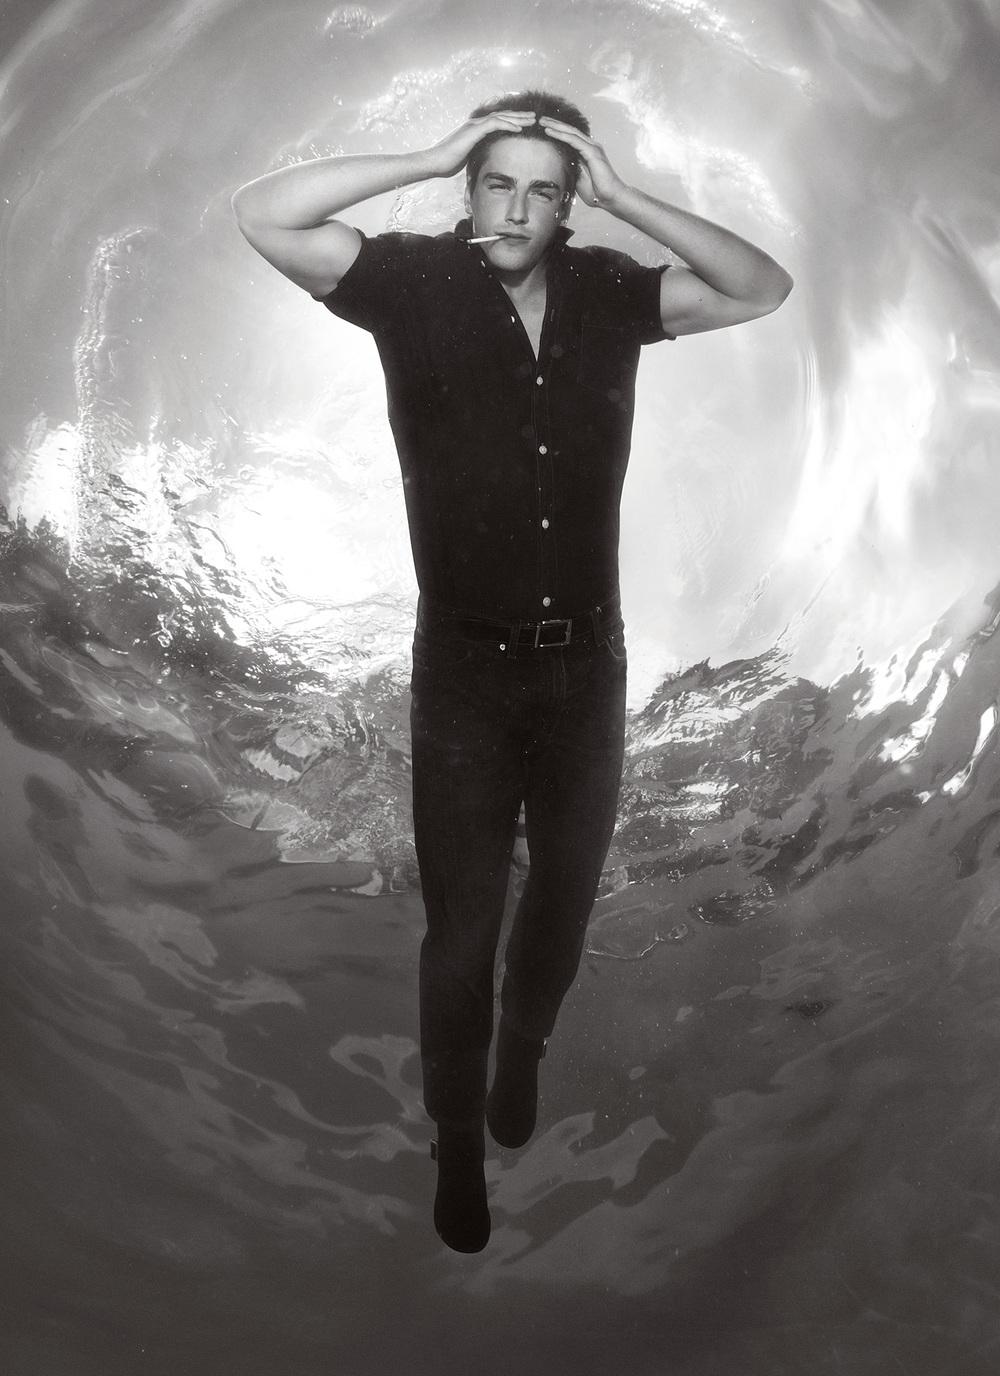 Underwater3_Shot03_167_05.jpg